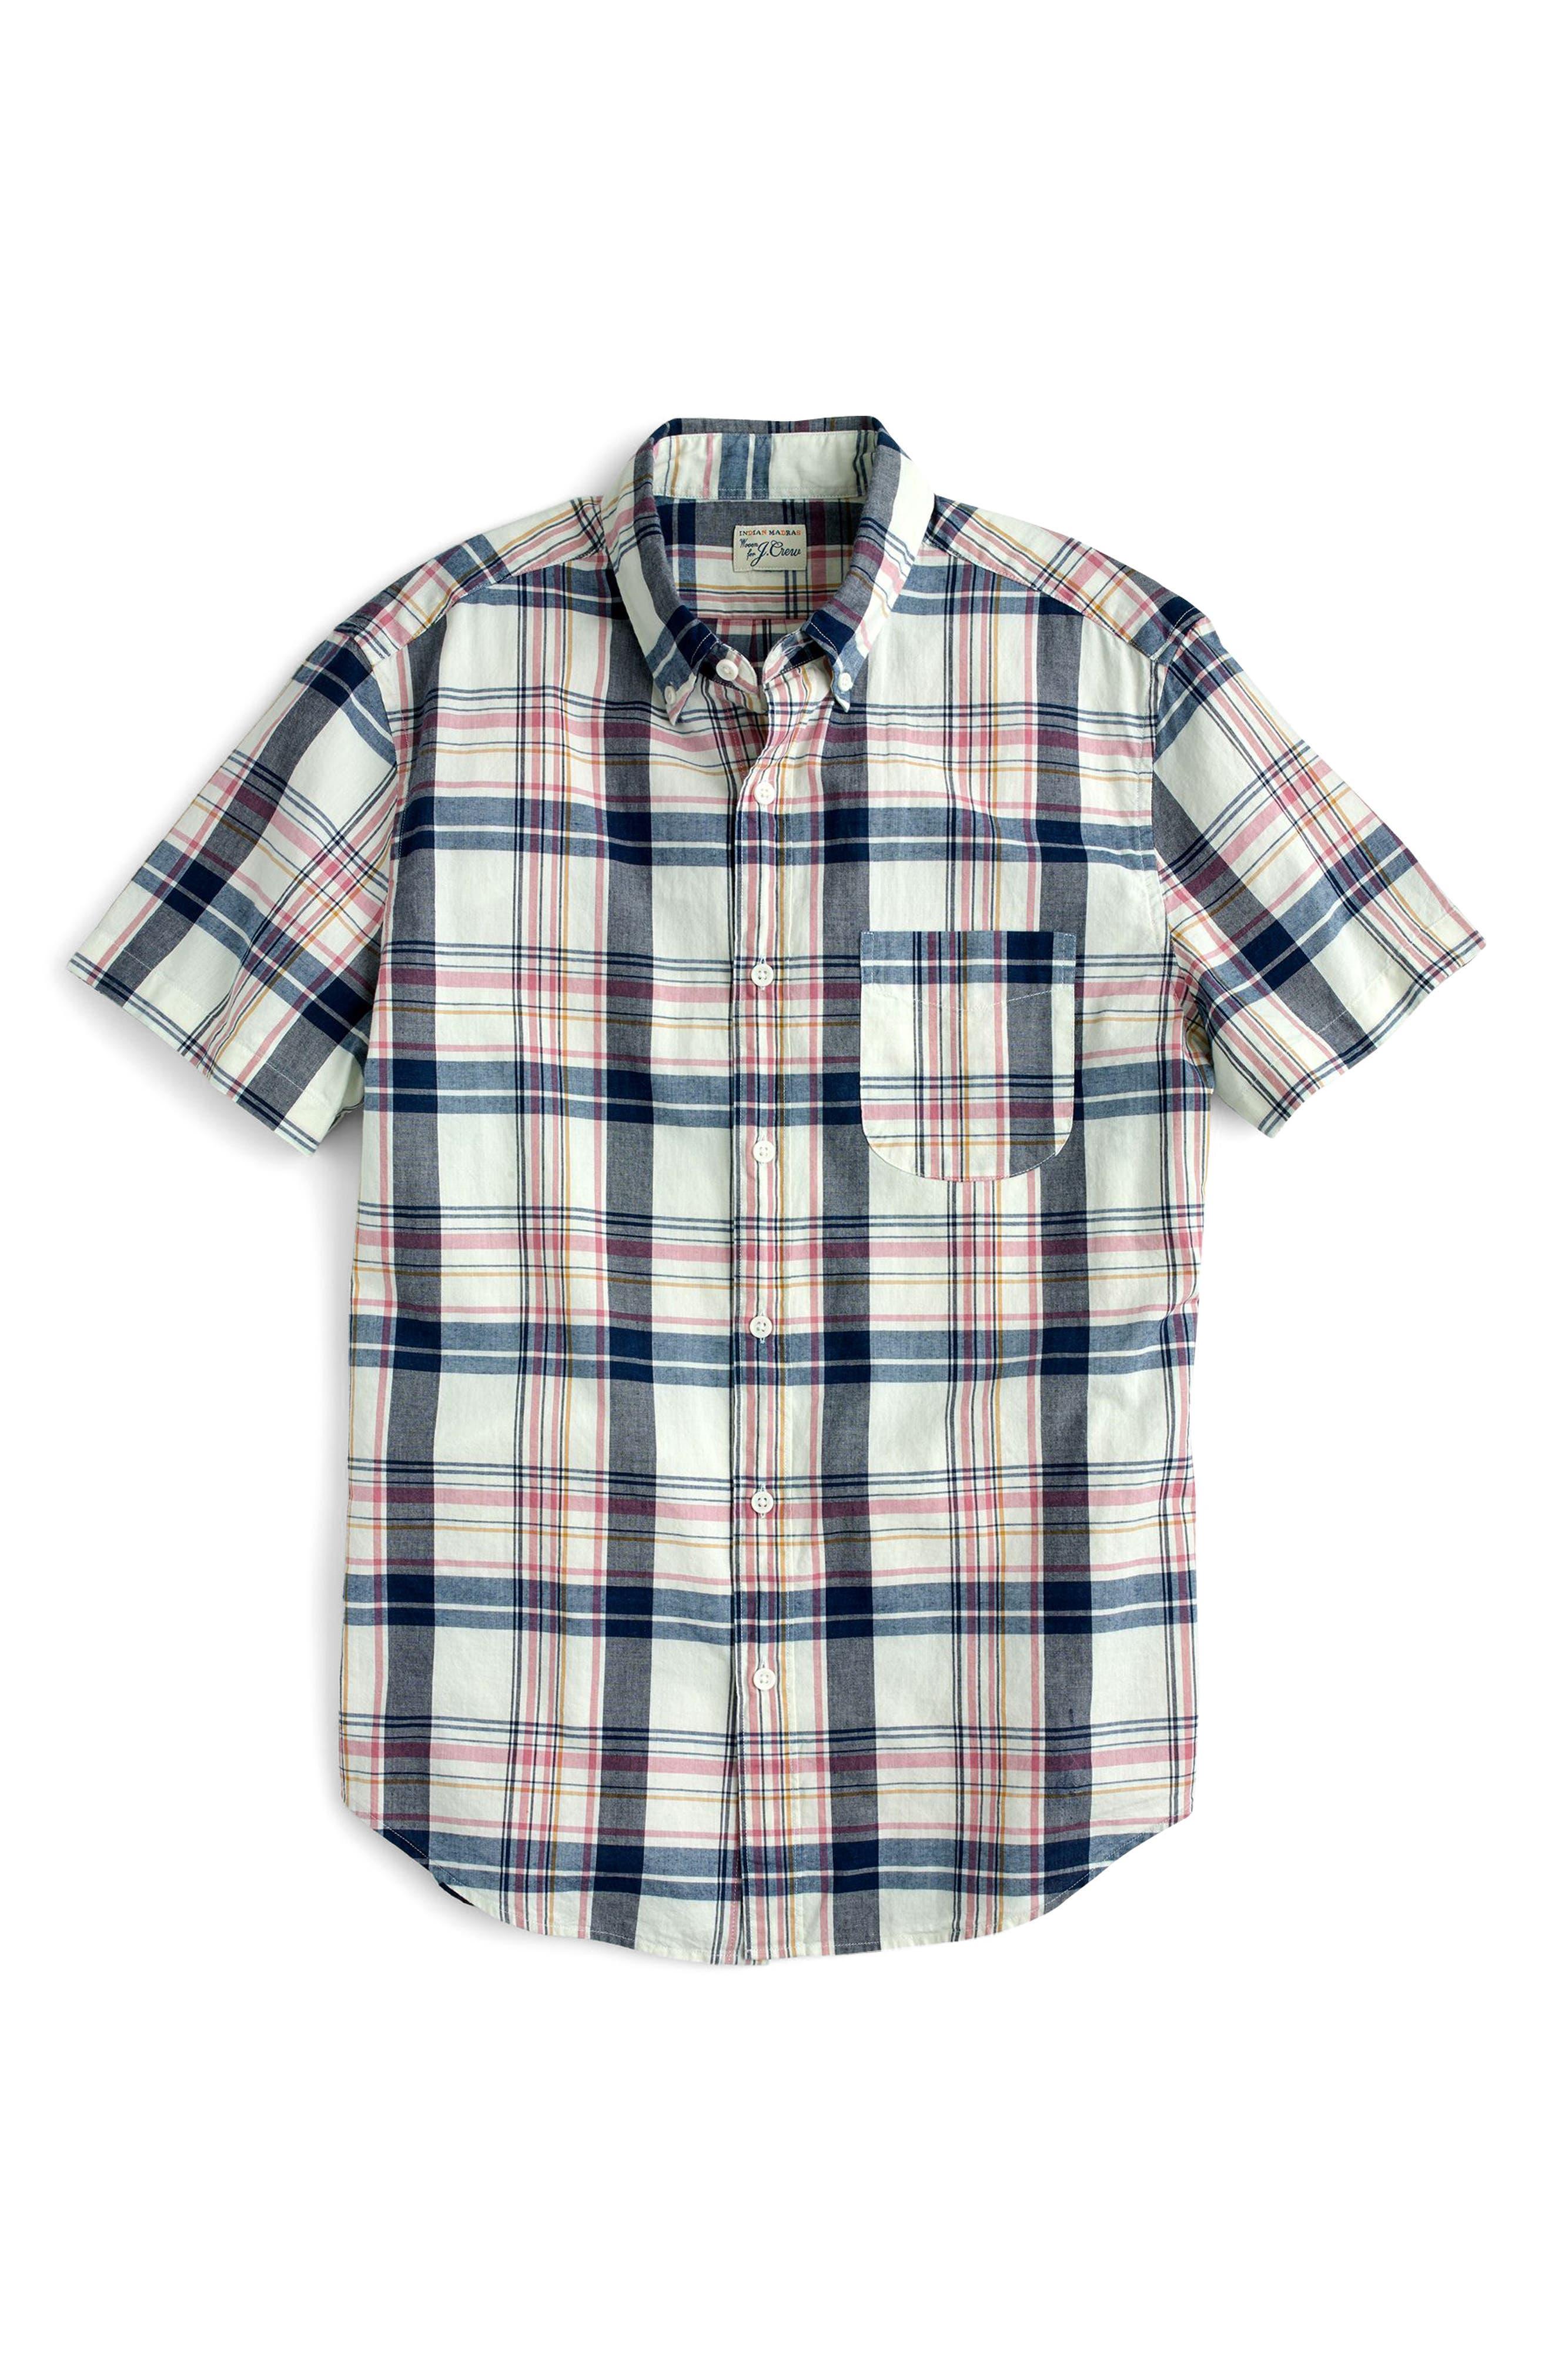 Indigo Plaid Short Sleeve Madras Shirt,                             Alternate thumbnail 4, color,                             Indigo Creme